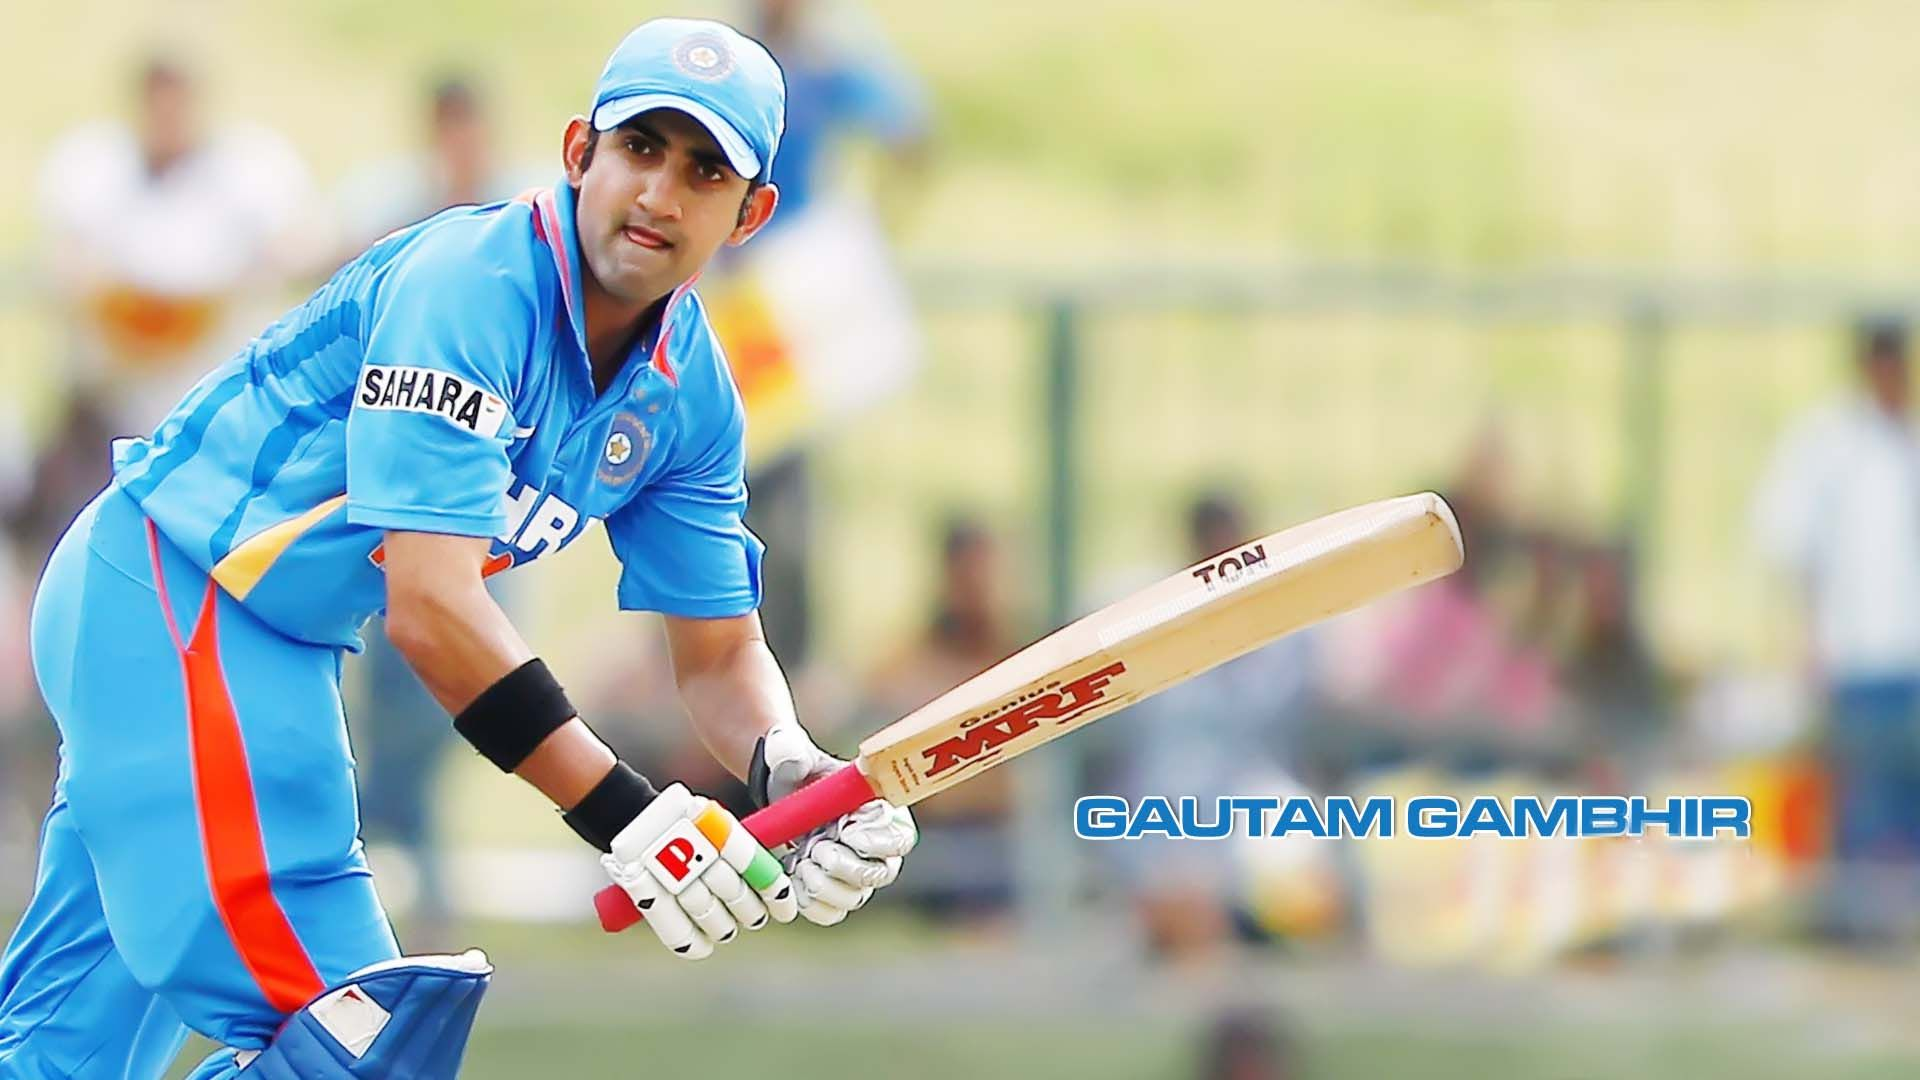 gautam gambhir indian cricketer wallpaper indian cricketer